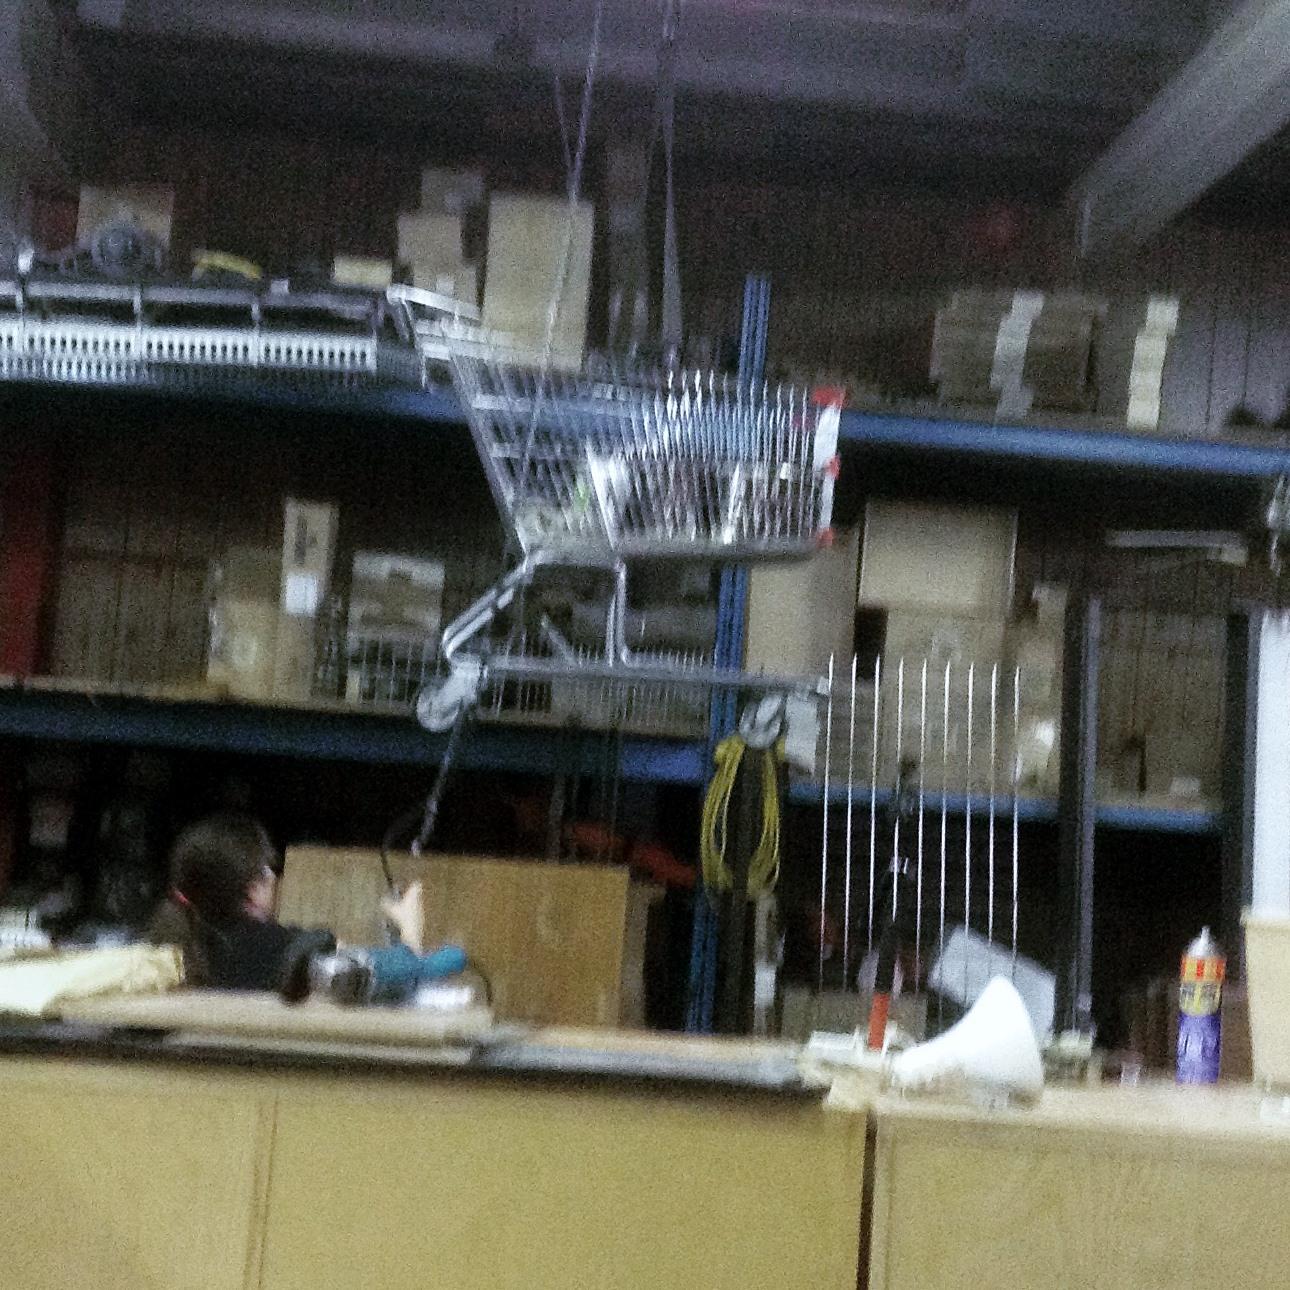 Shopping cart in the air